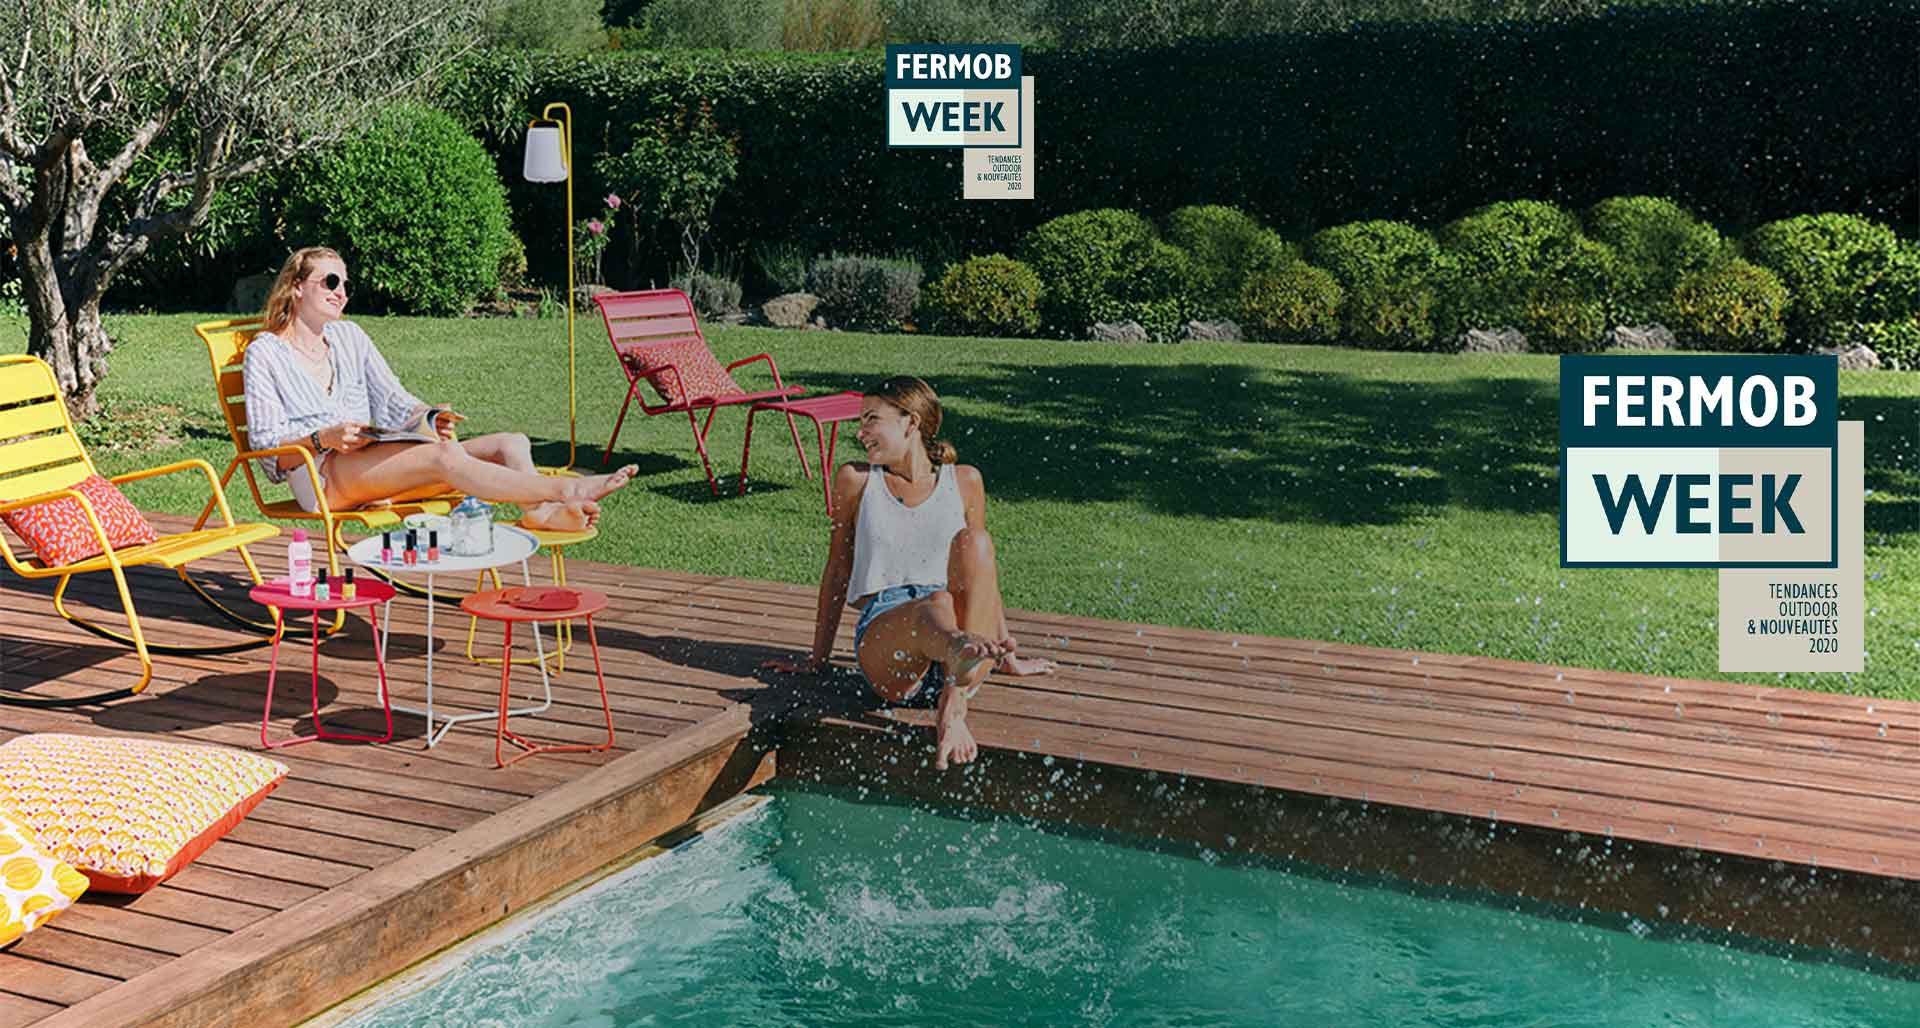 Jardineries Truffaut : Spécialiste Jardin, Animaux, Maison ... encequiconcerne Truffaut Table De Jardin